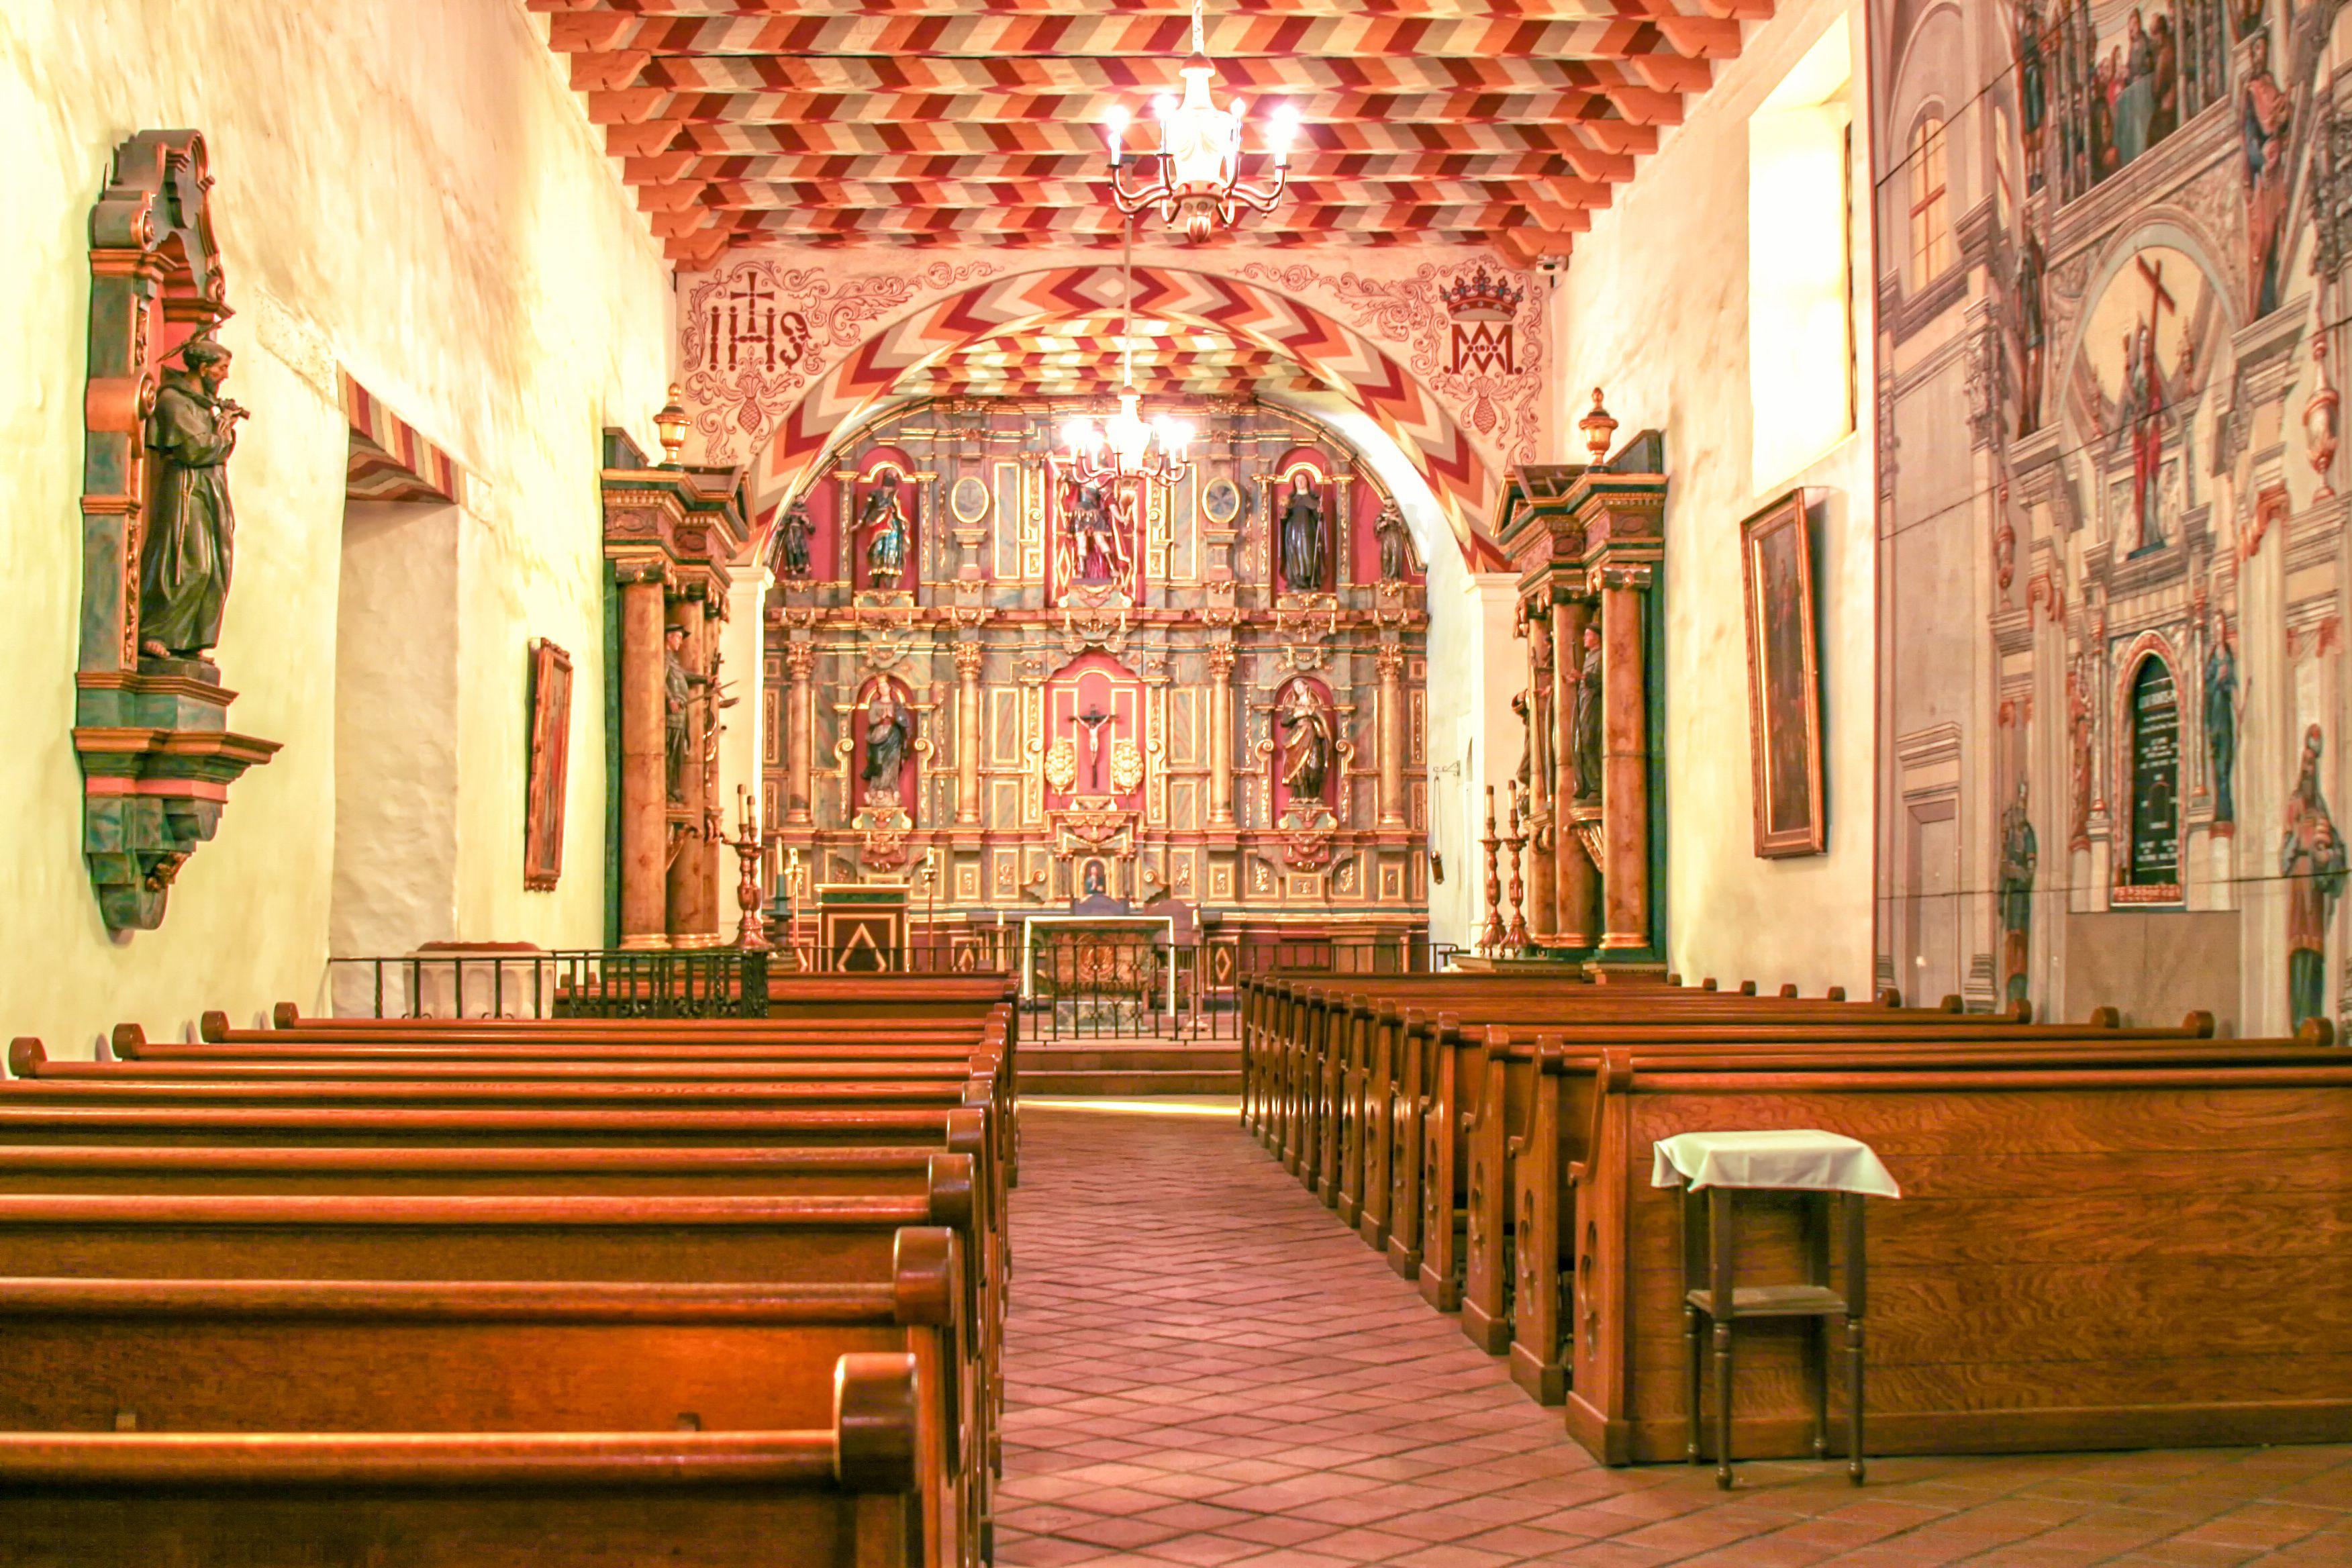 Interior of Mission San Francisco de Asis